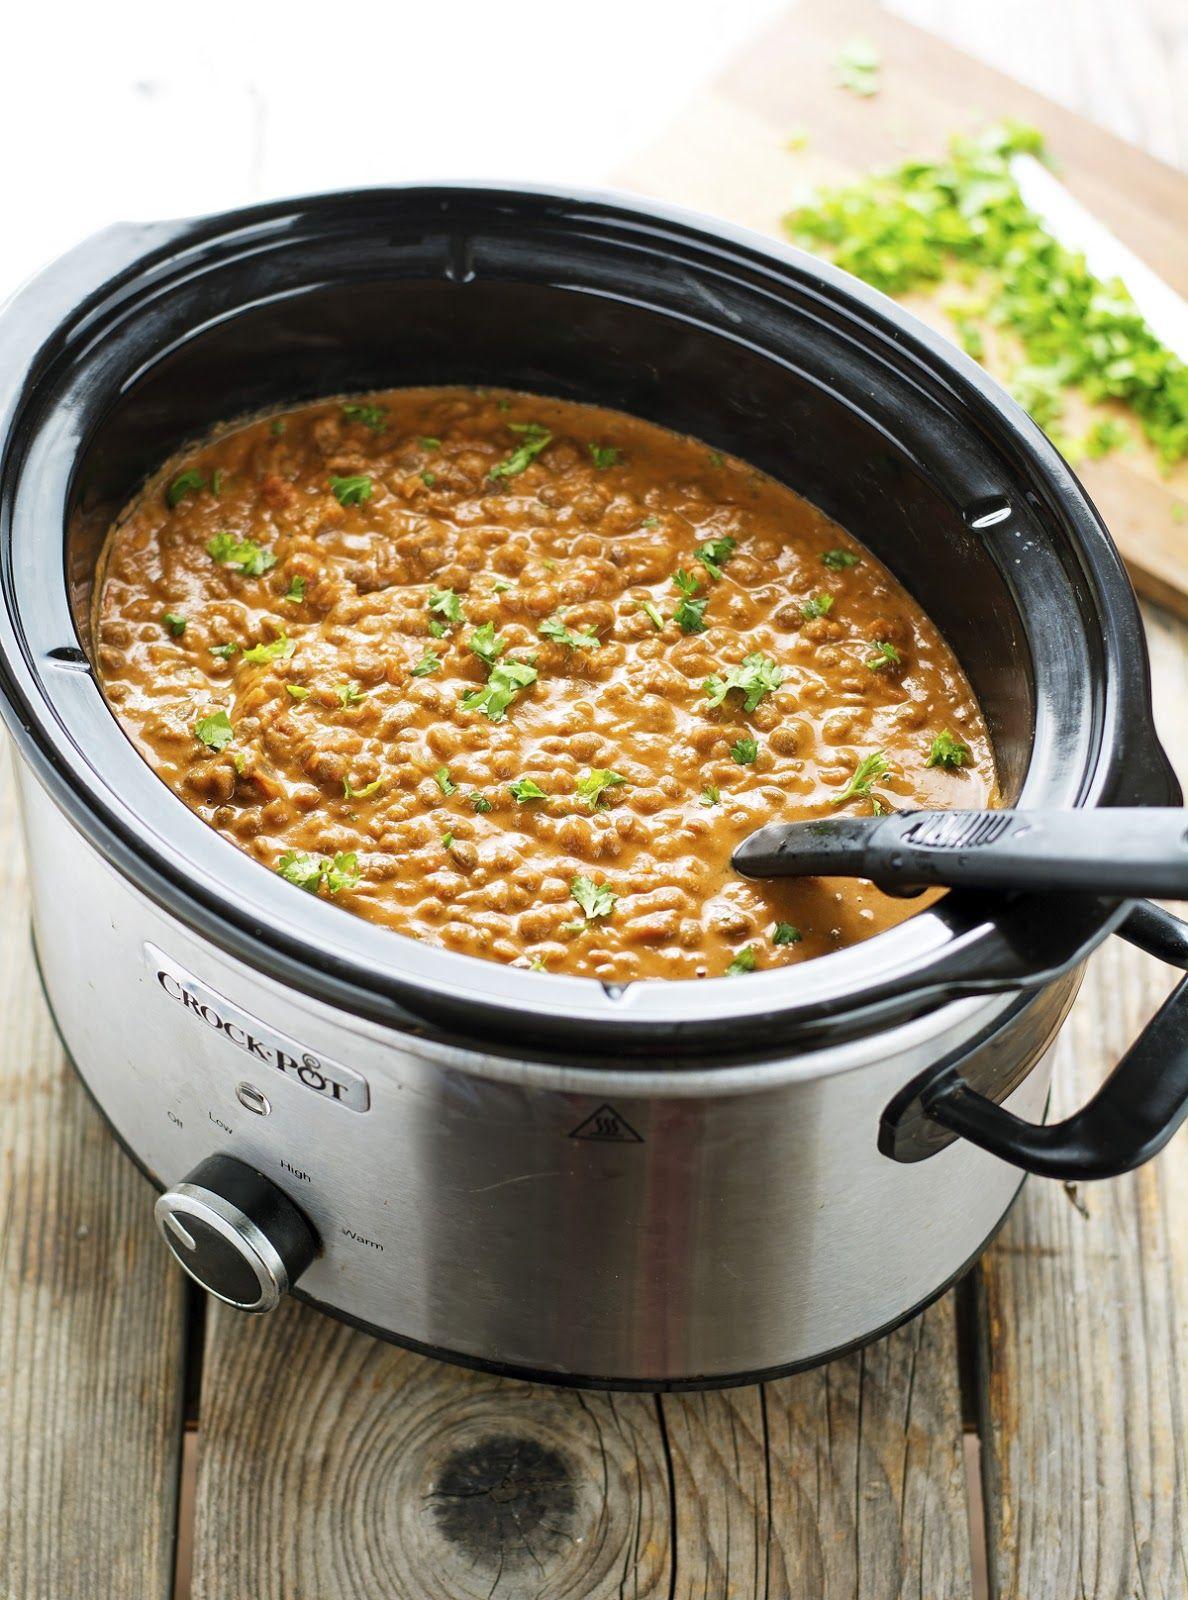 (Vegan) Easy Crock-Pot Curry Lentils